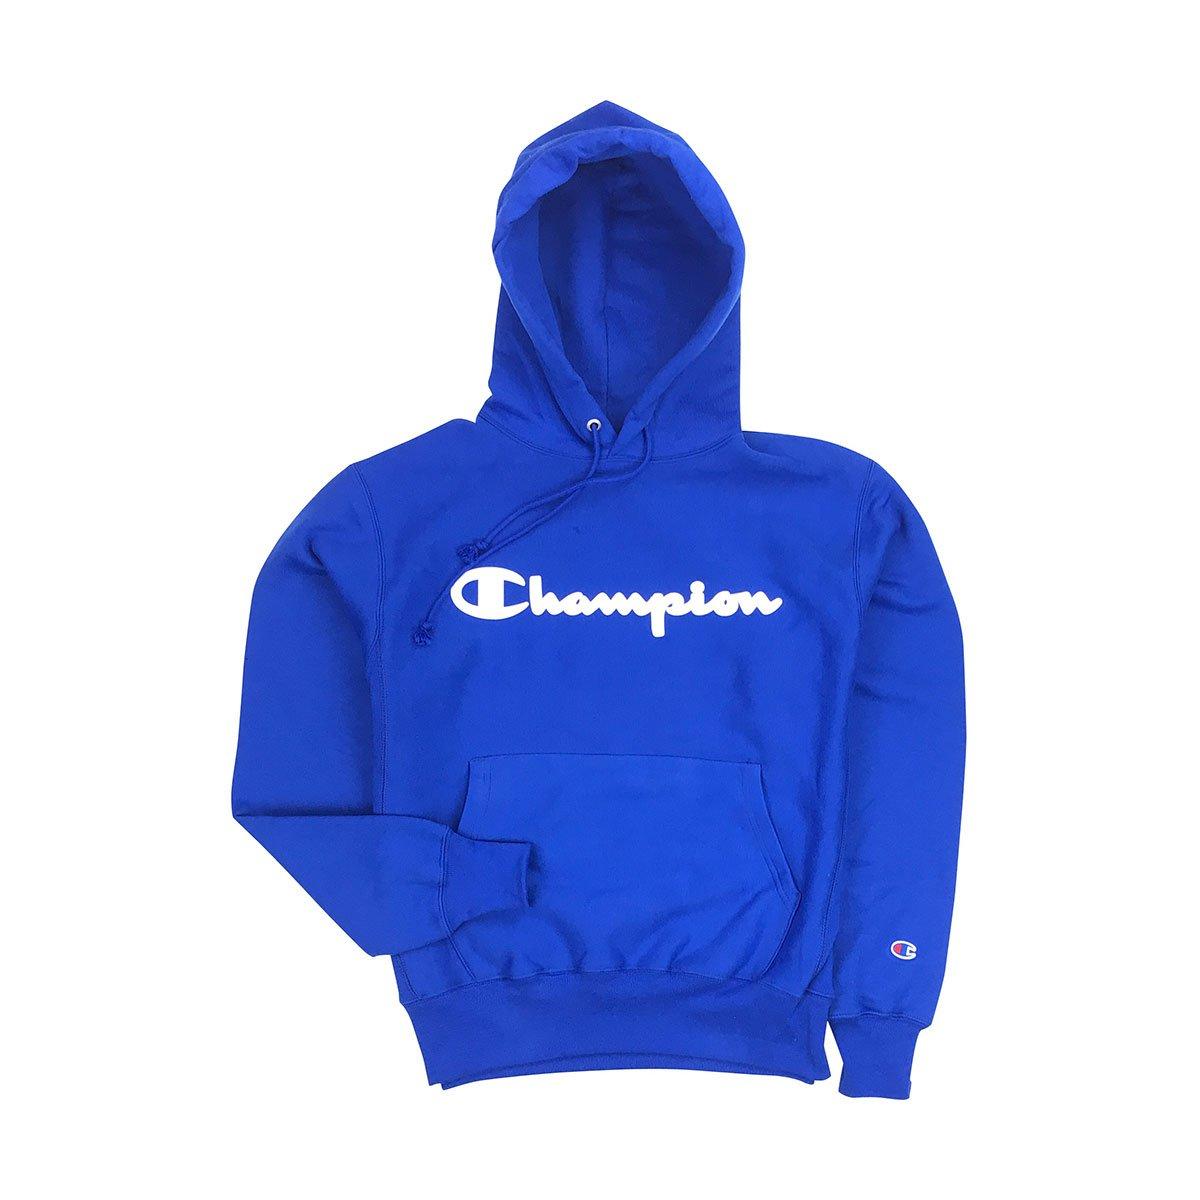 CHAMPION Sweatshirt Hoodie